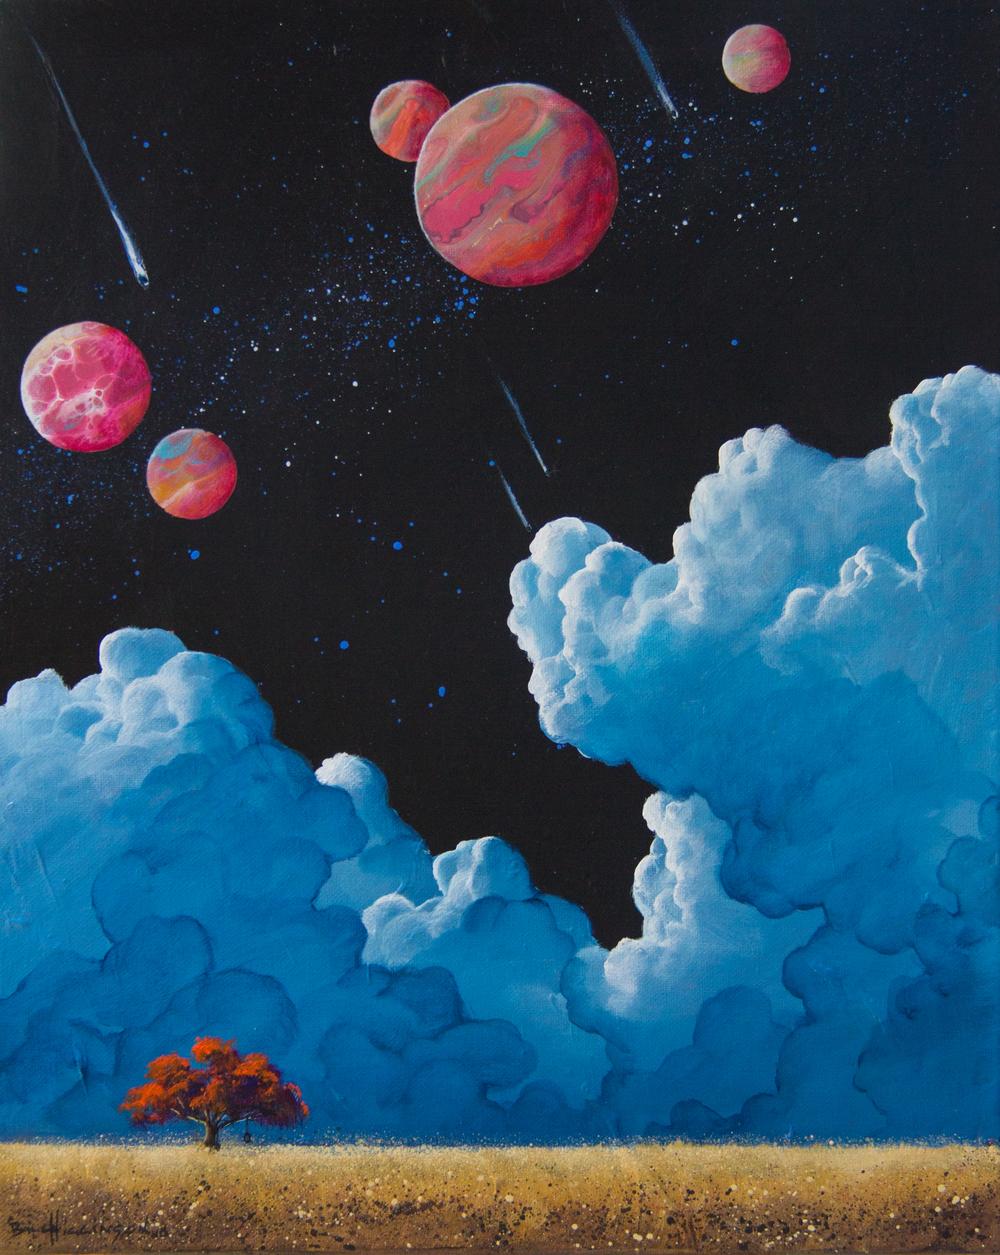 bill-higginson/art/meteor-shower/childrens-fantasy-landscape-surrealism